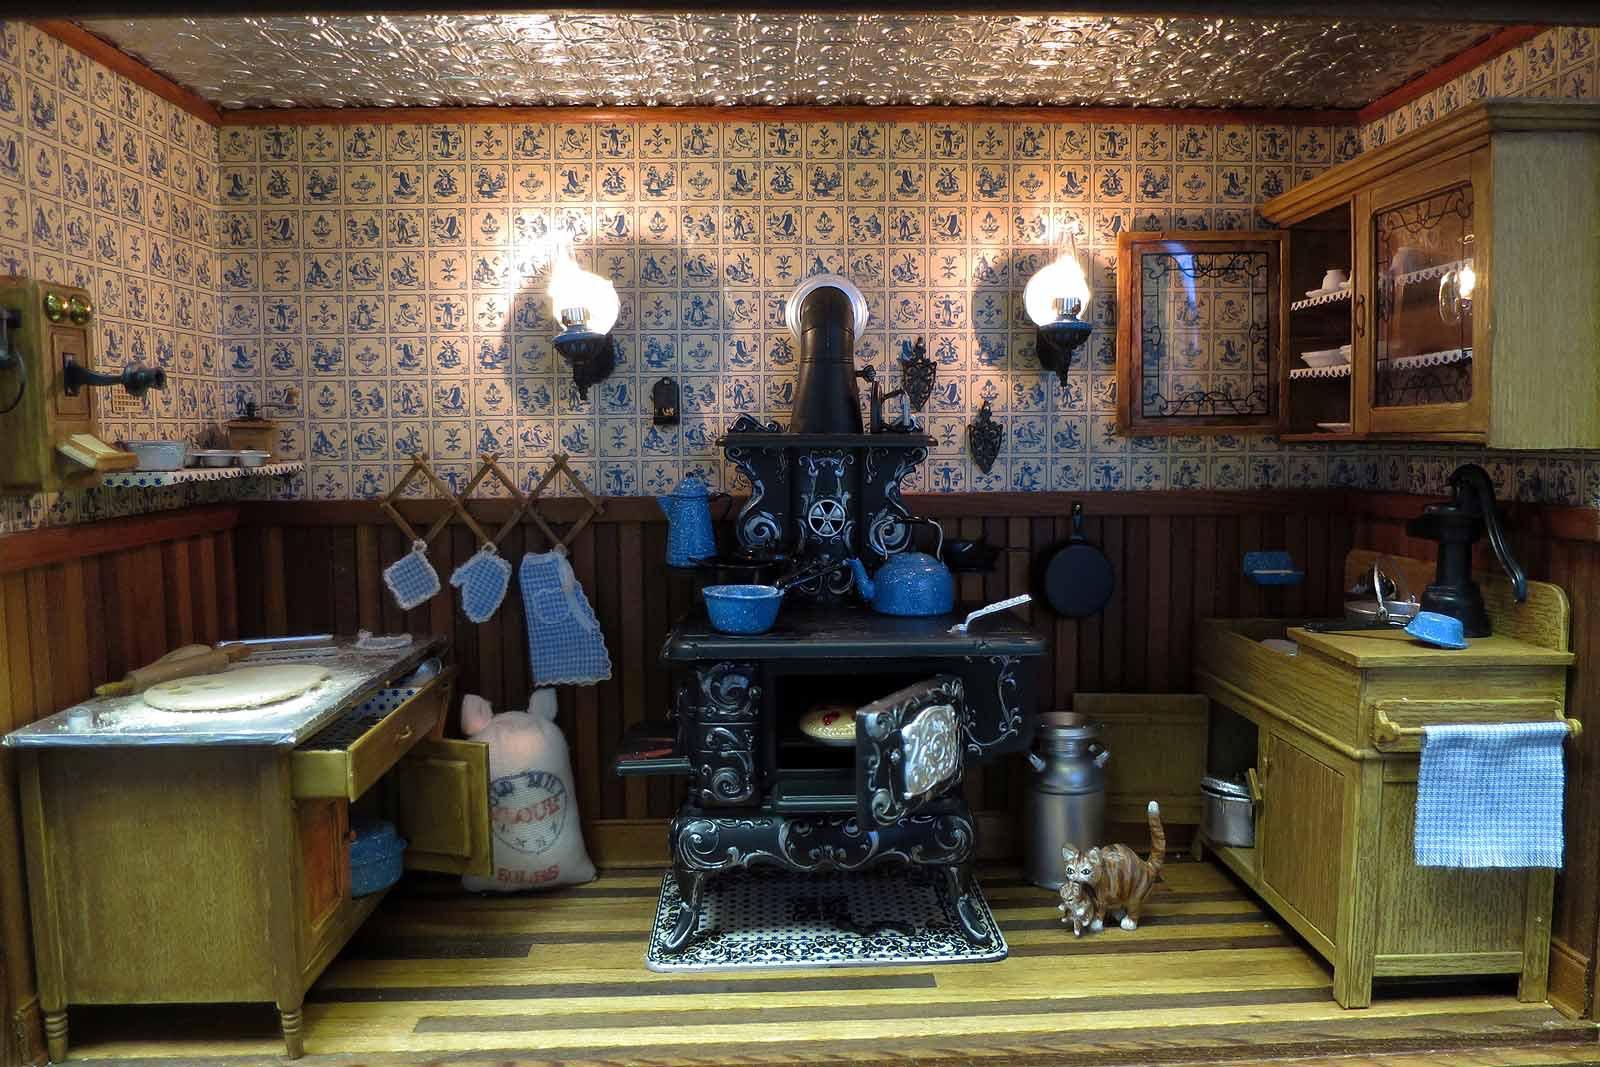 Amazing Victorian Kitchen Decoration (View 1 of 18)